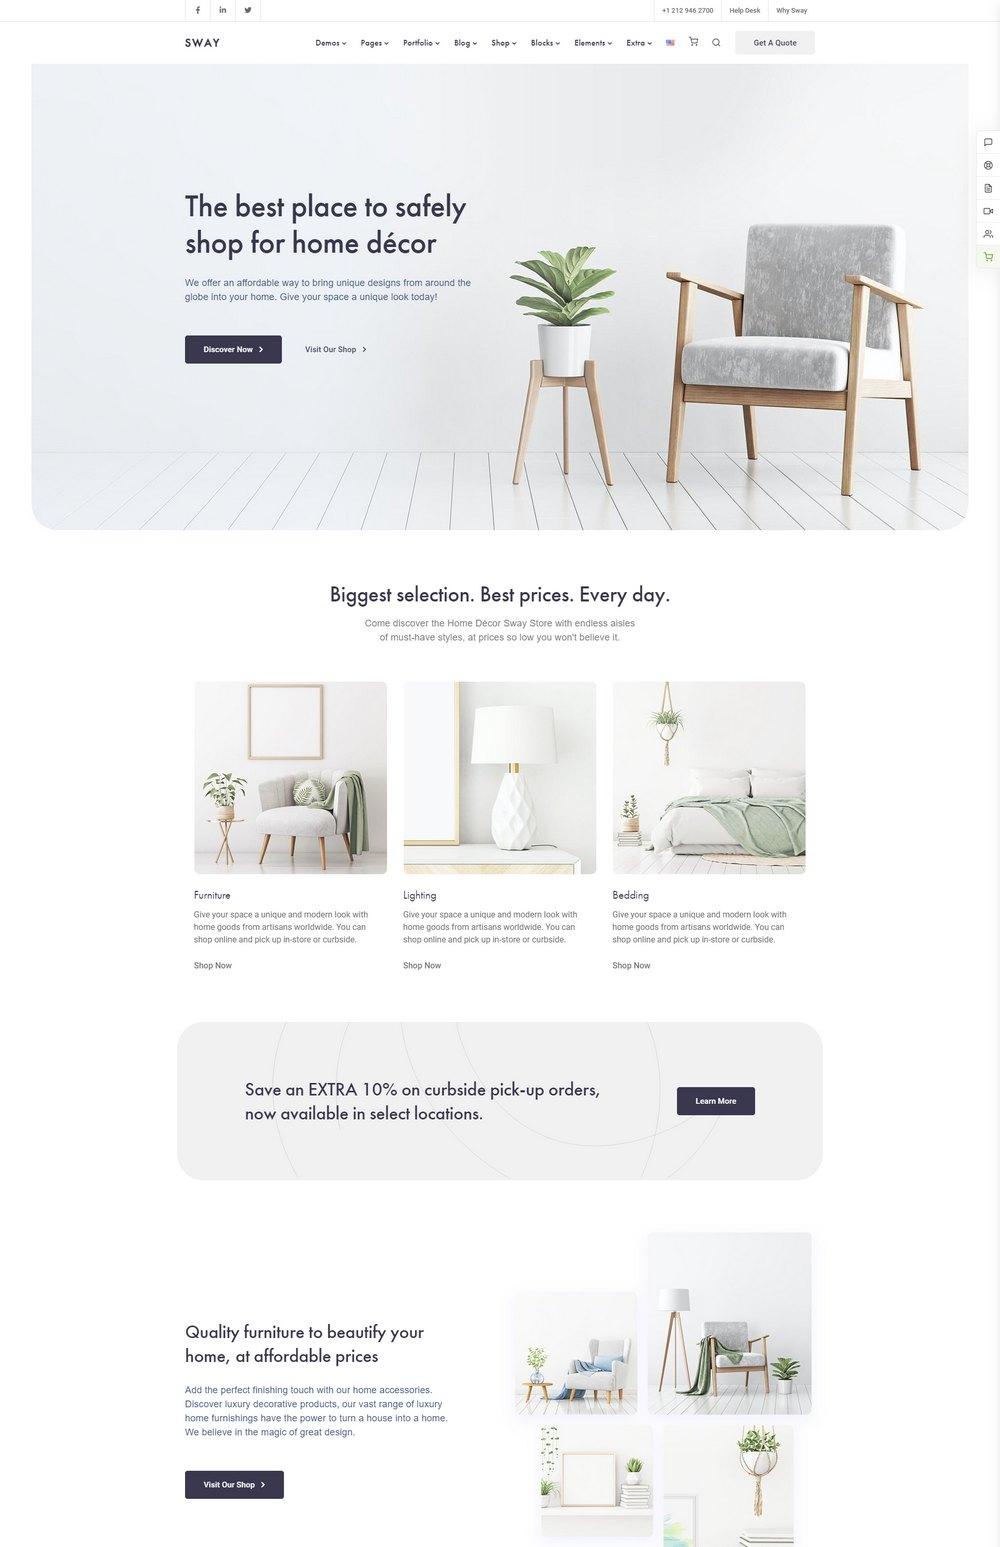 swaytheme-home-decor-wp-theme